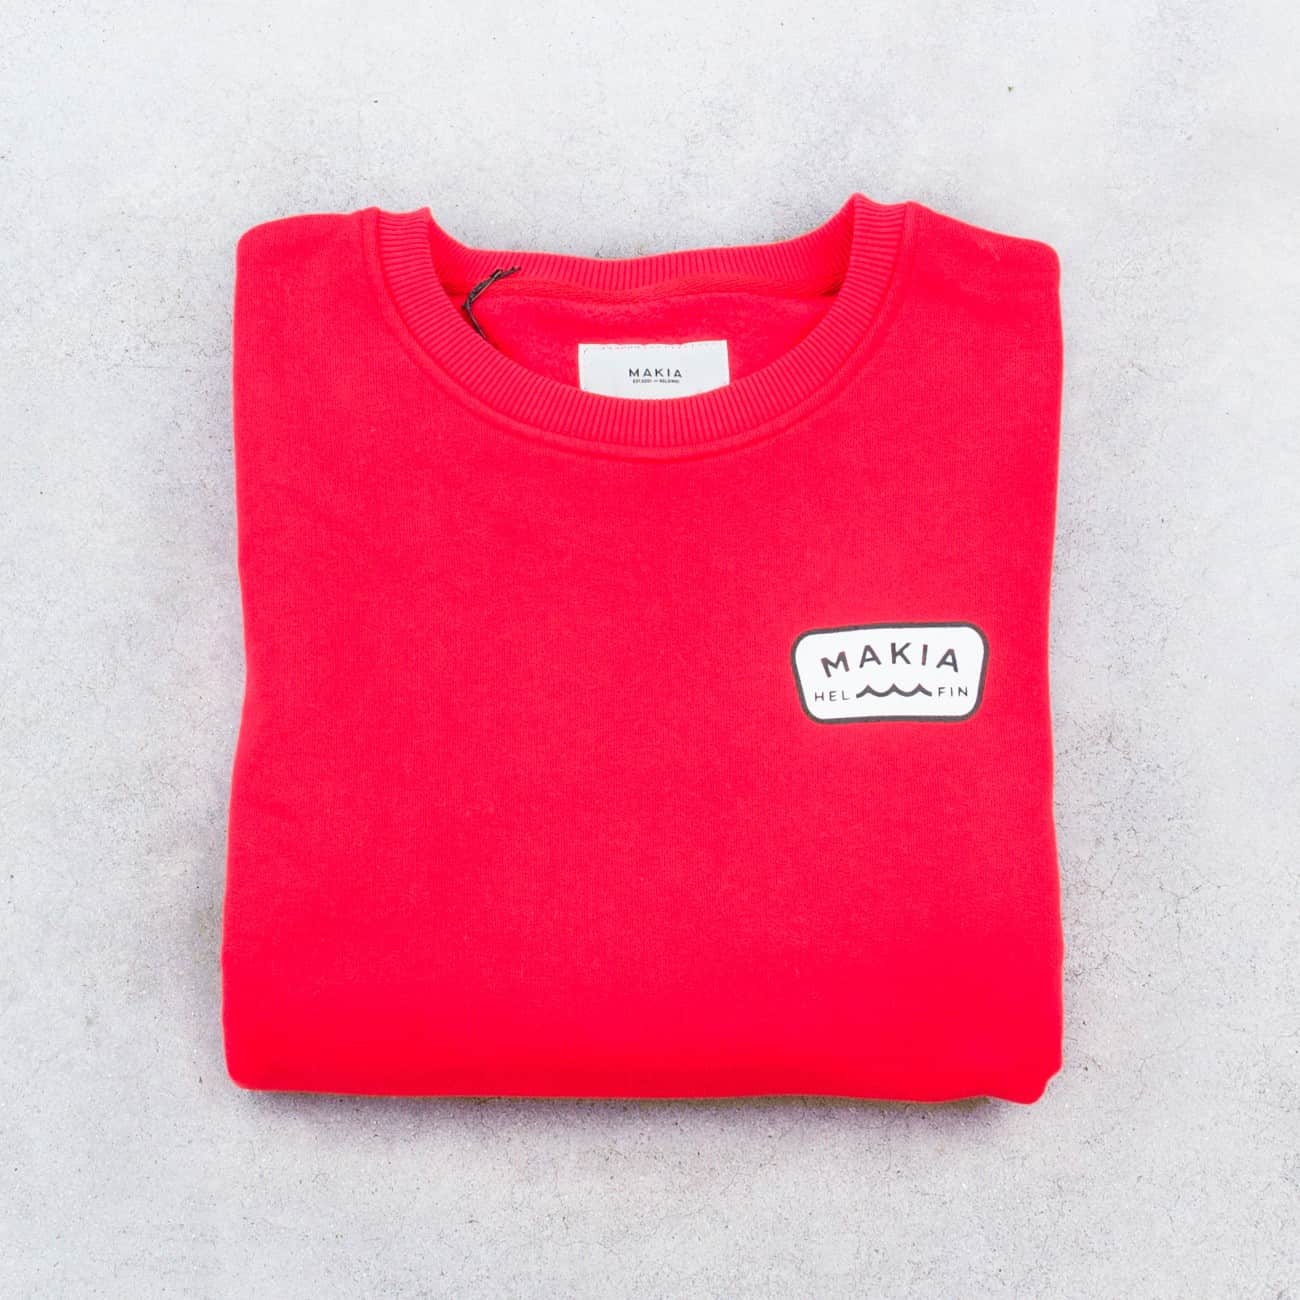 Emblem sweatshirt